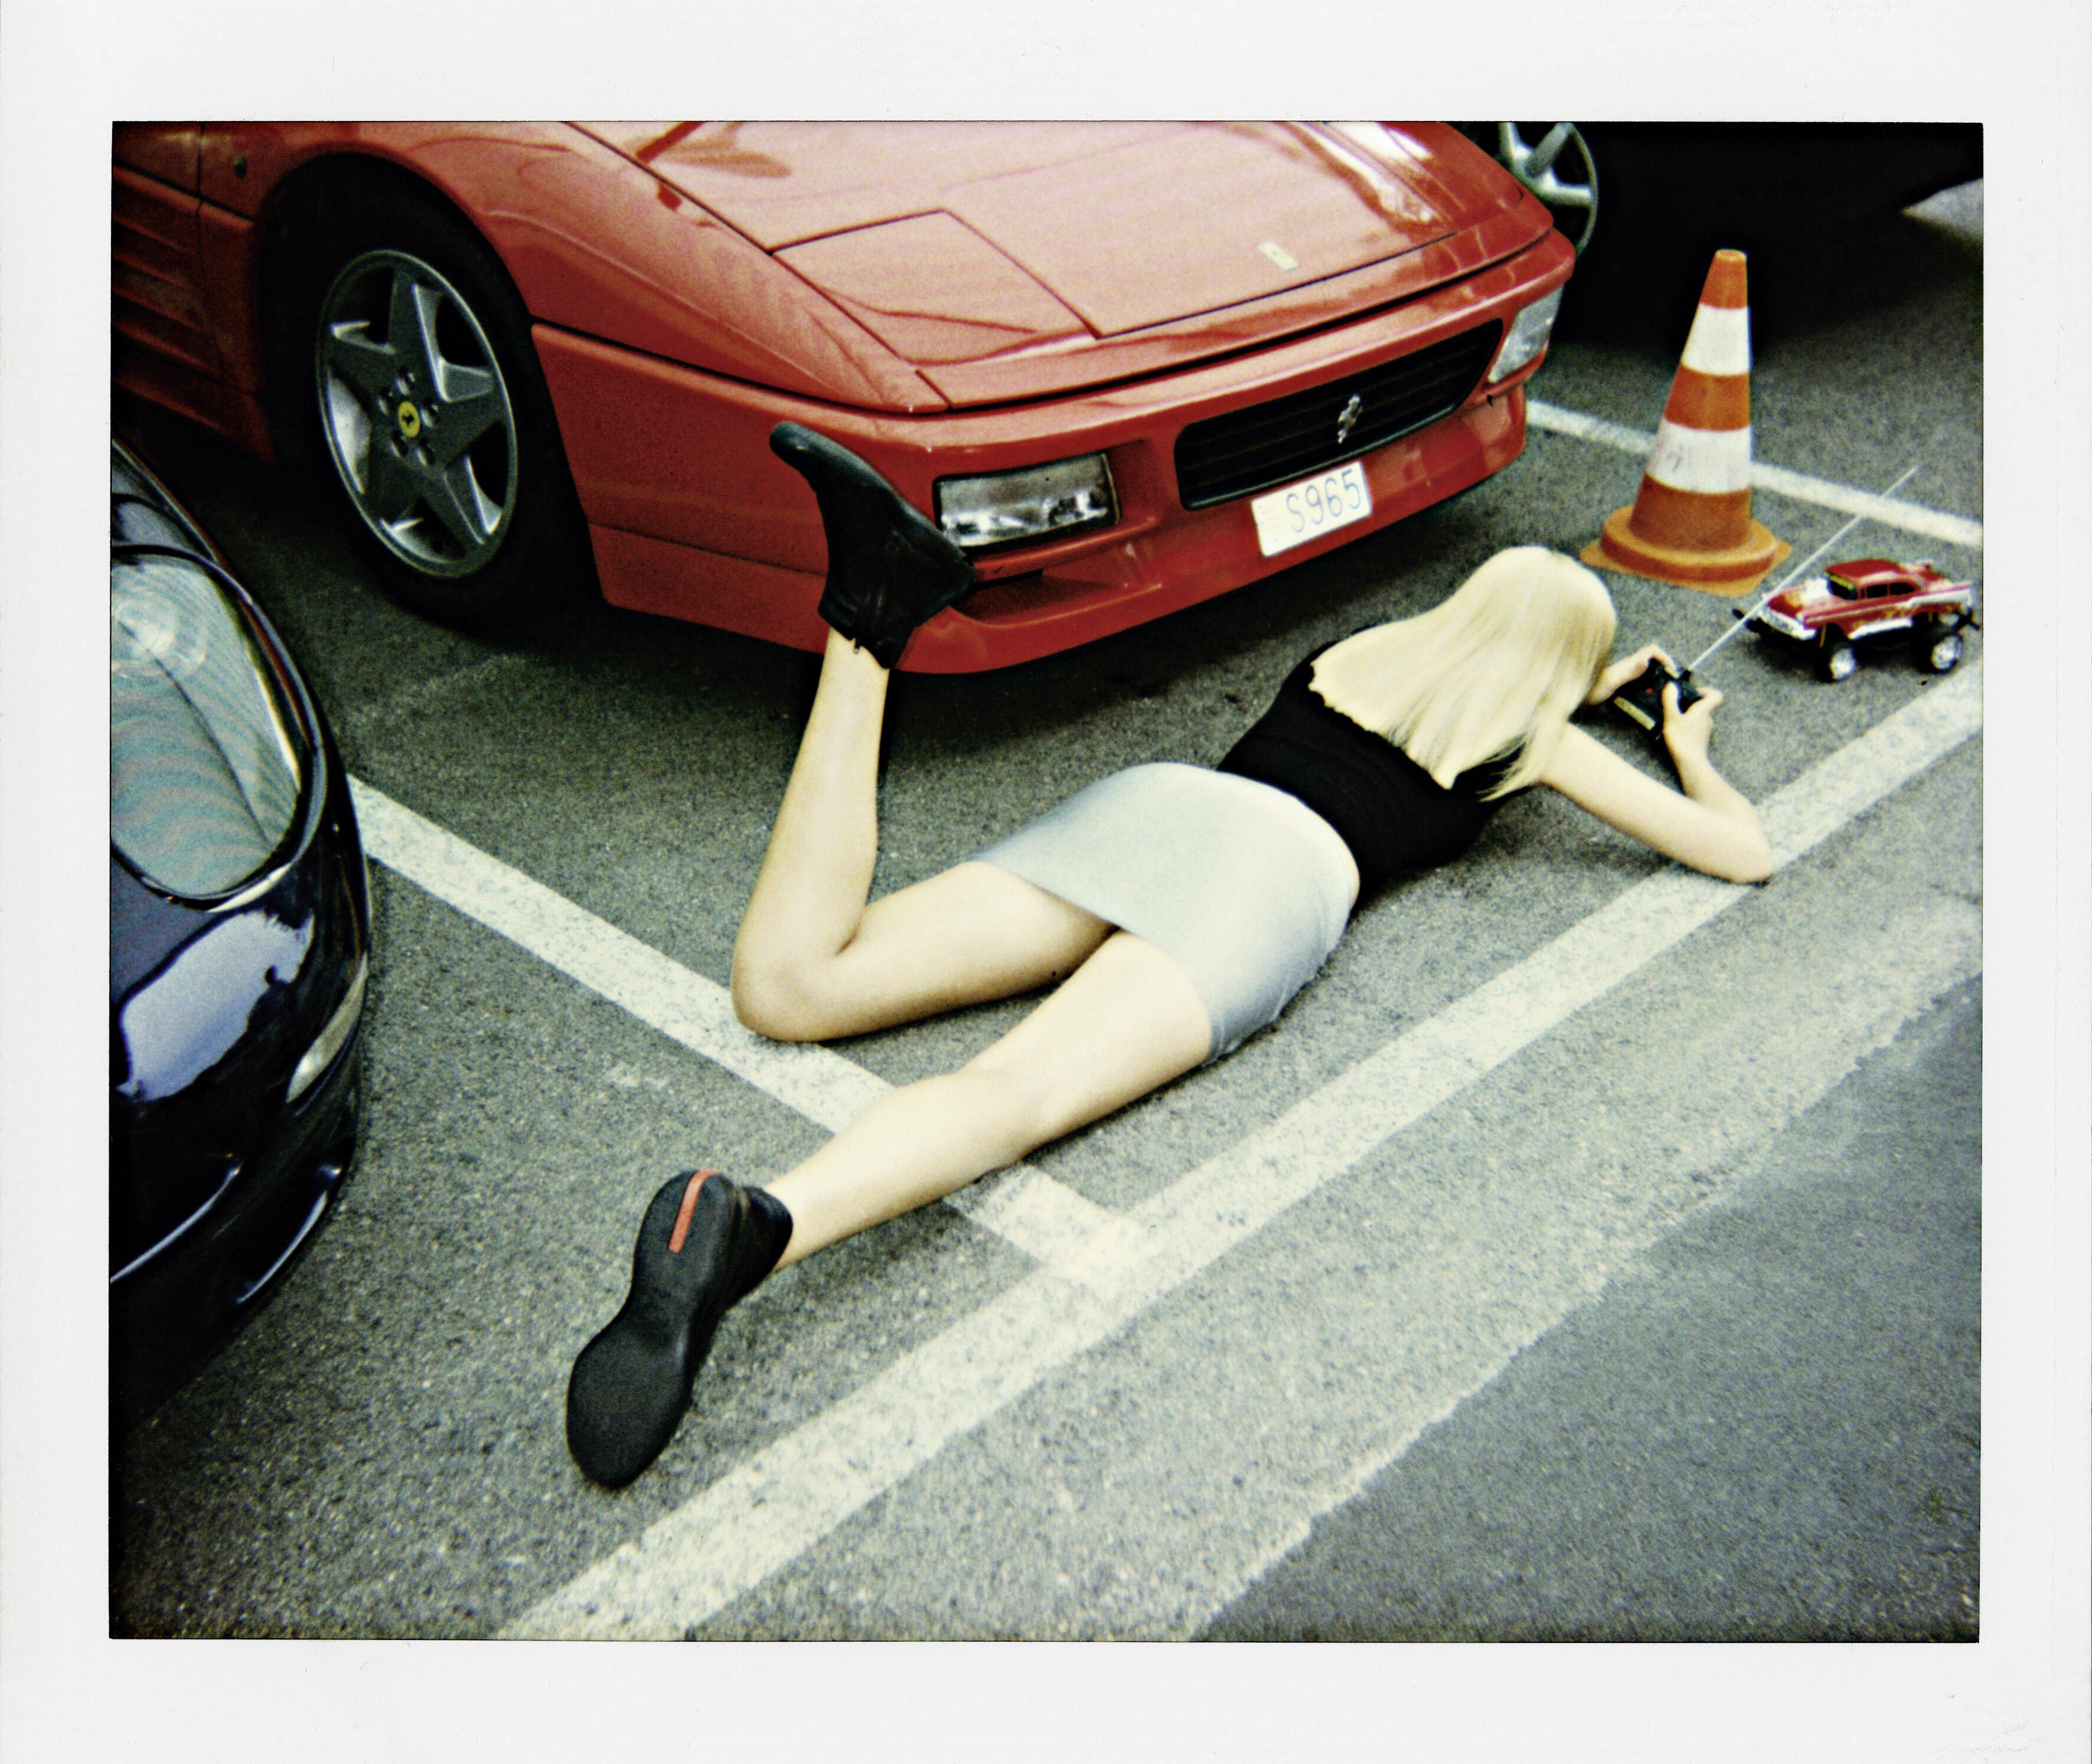 Монте-Карло, для US Vogue, 1998. Фотограф Хельмут Ньютон